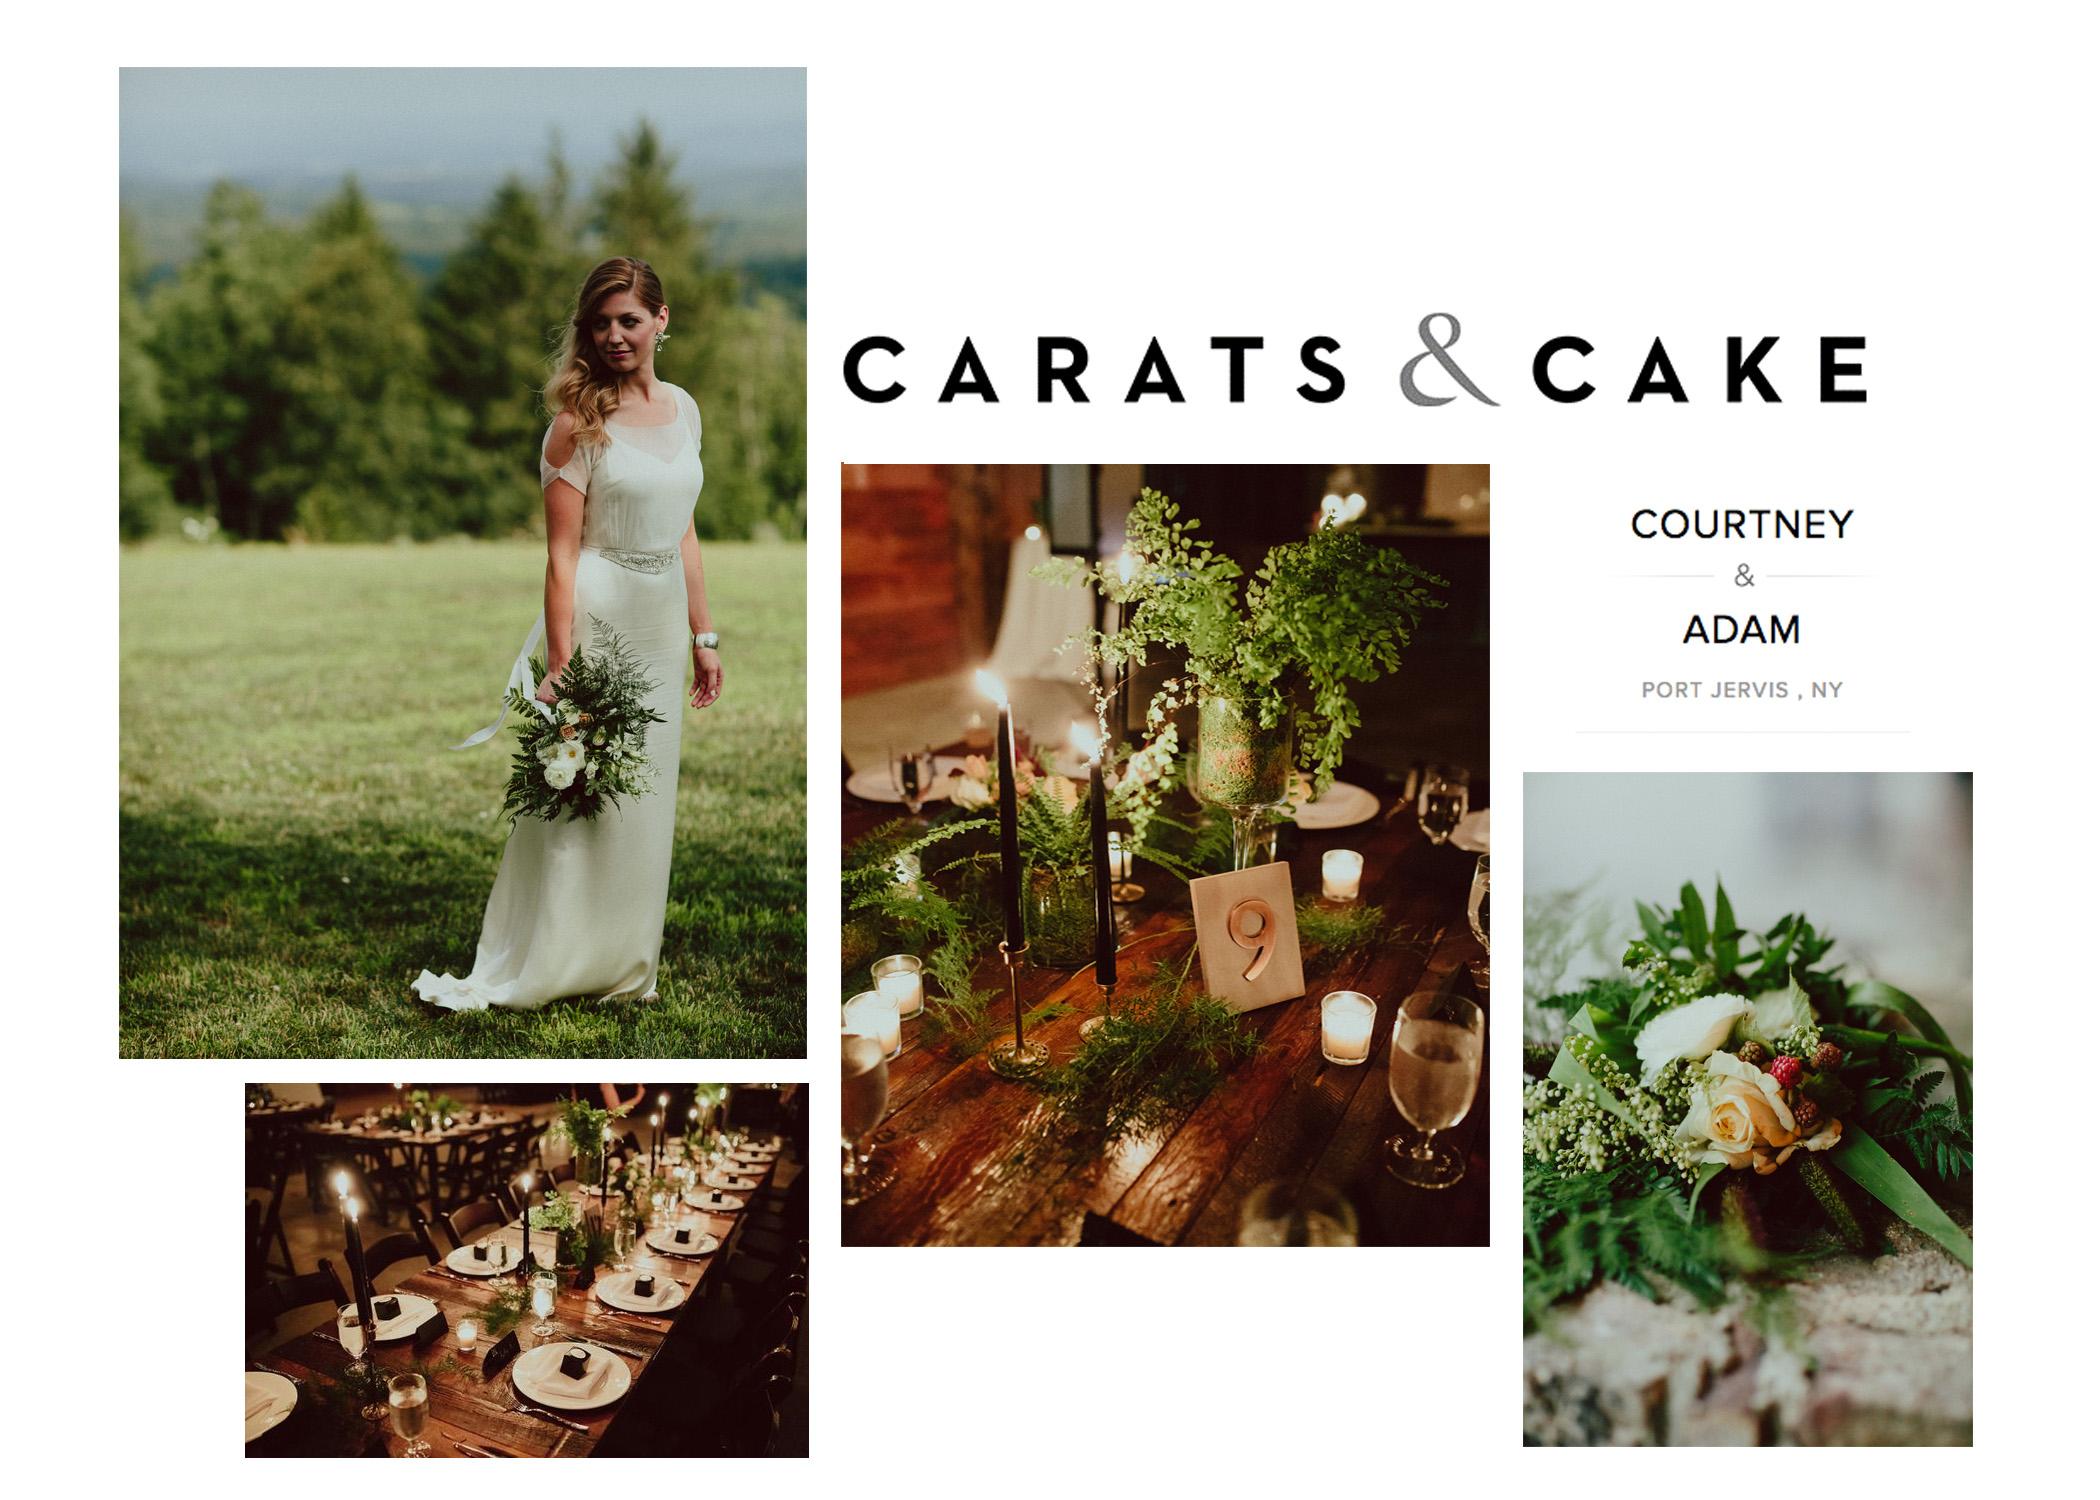 Carats & Cake profile